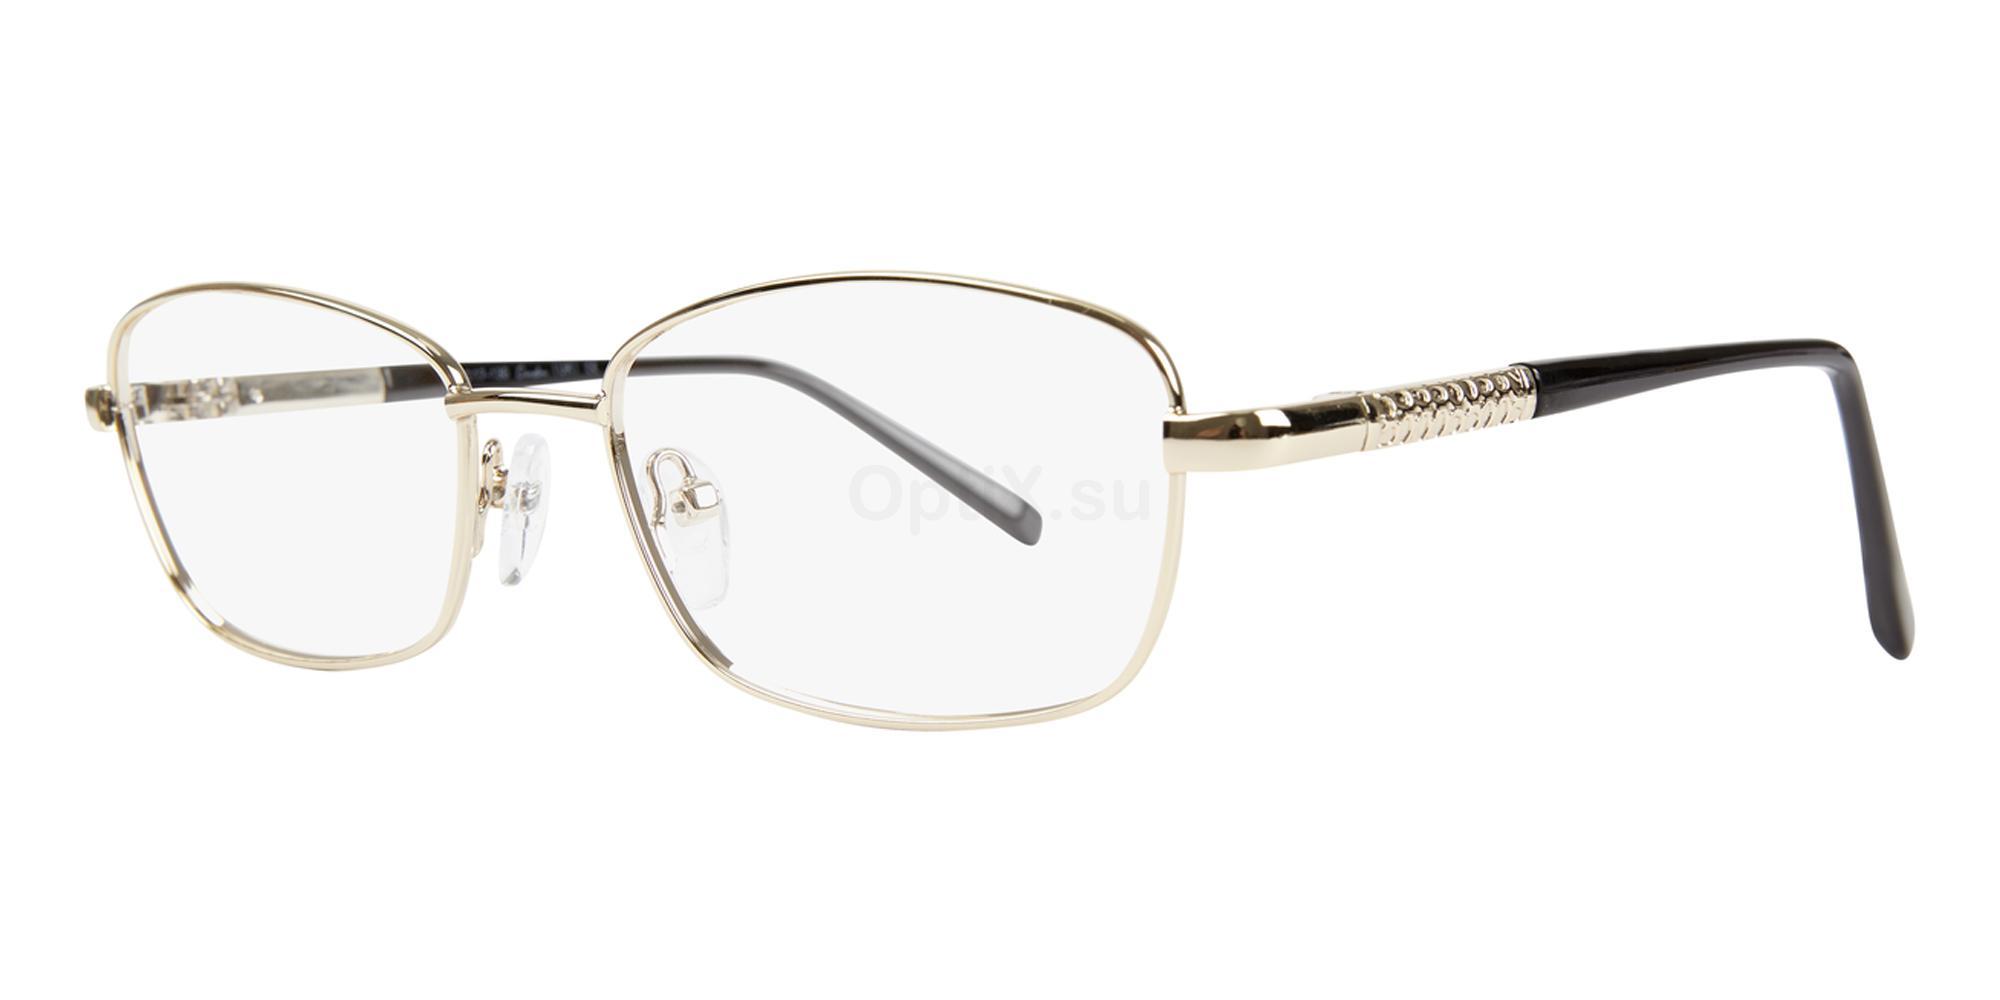 C1 Complete 2 Mod 7 Glasses, Complete